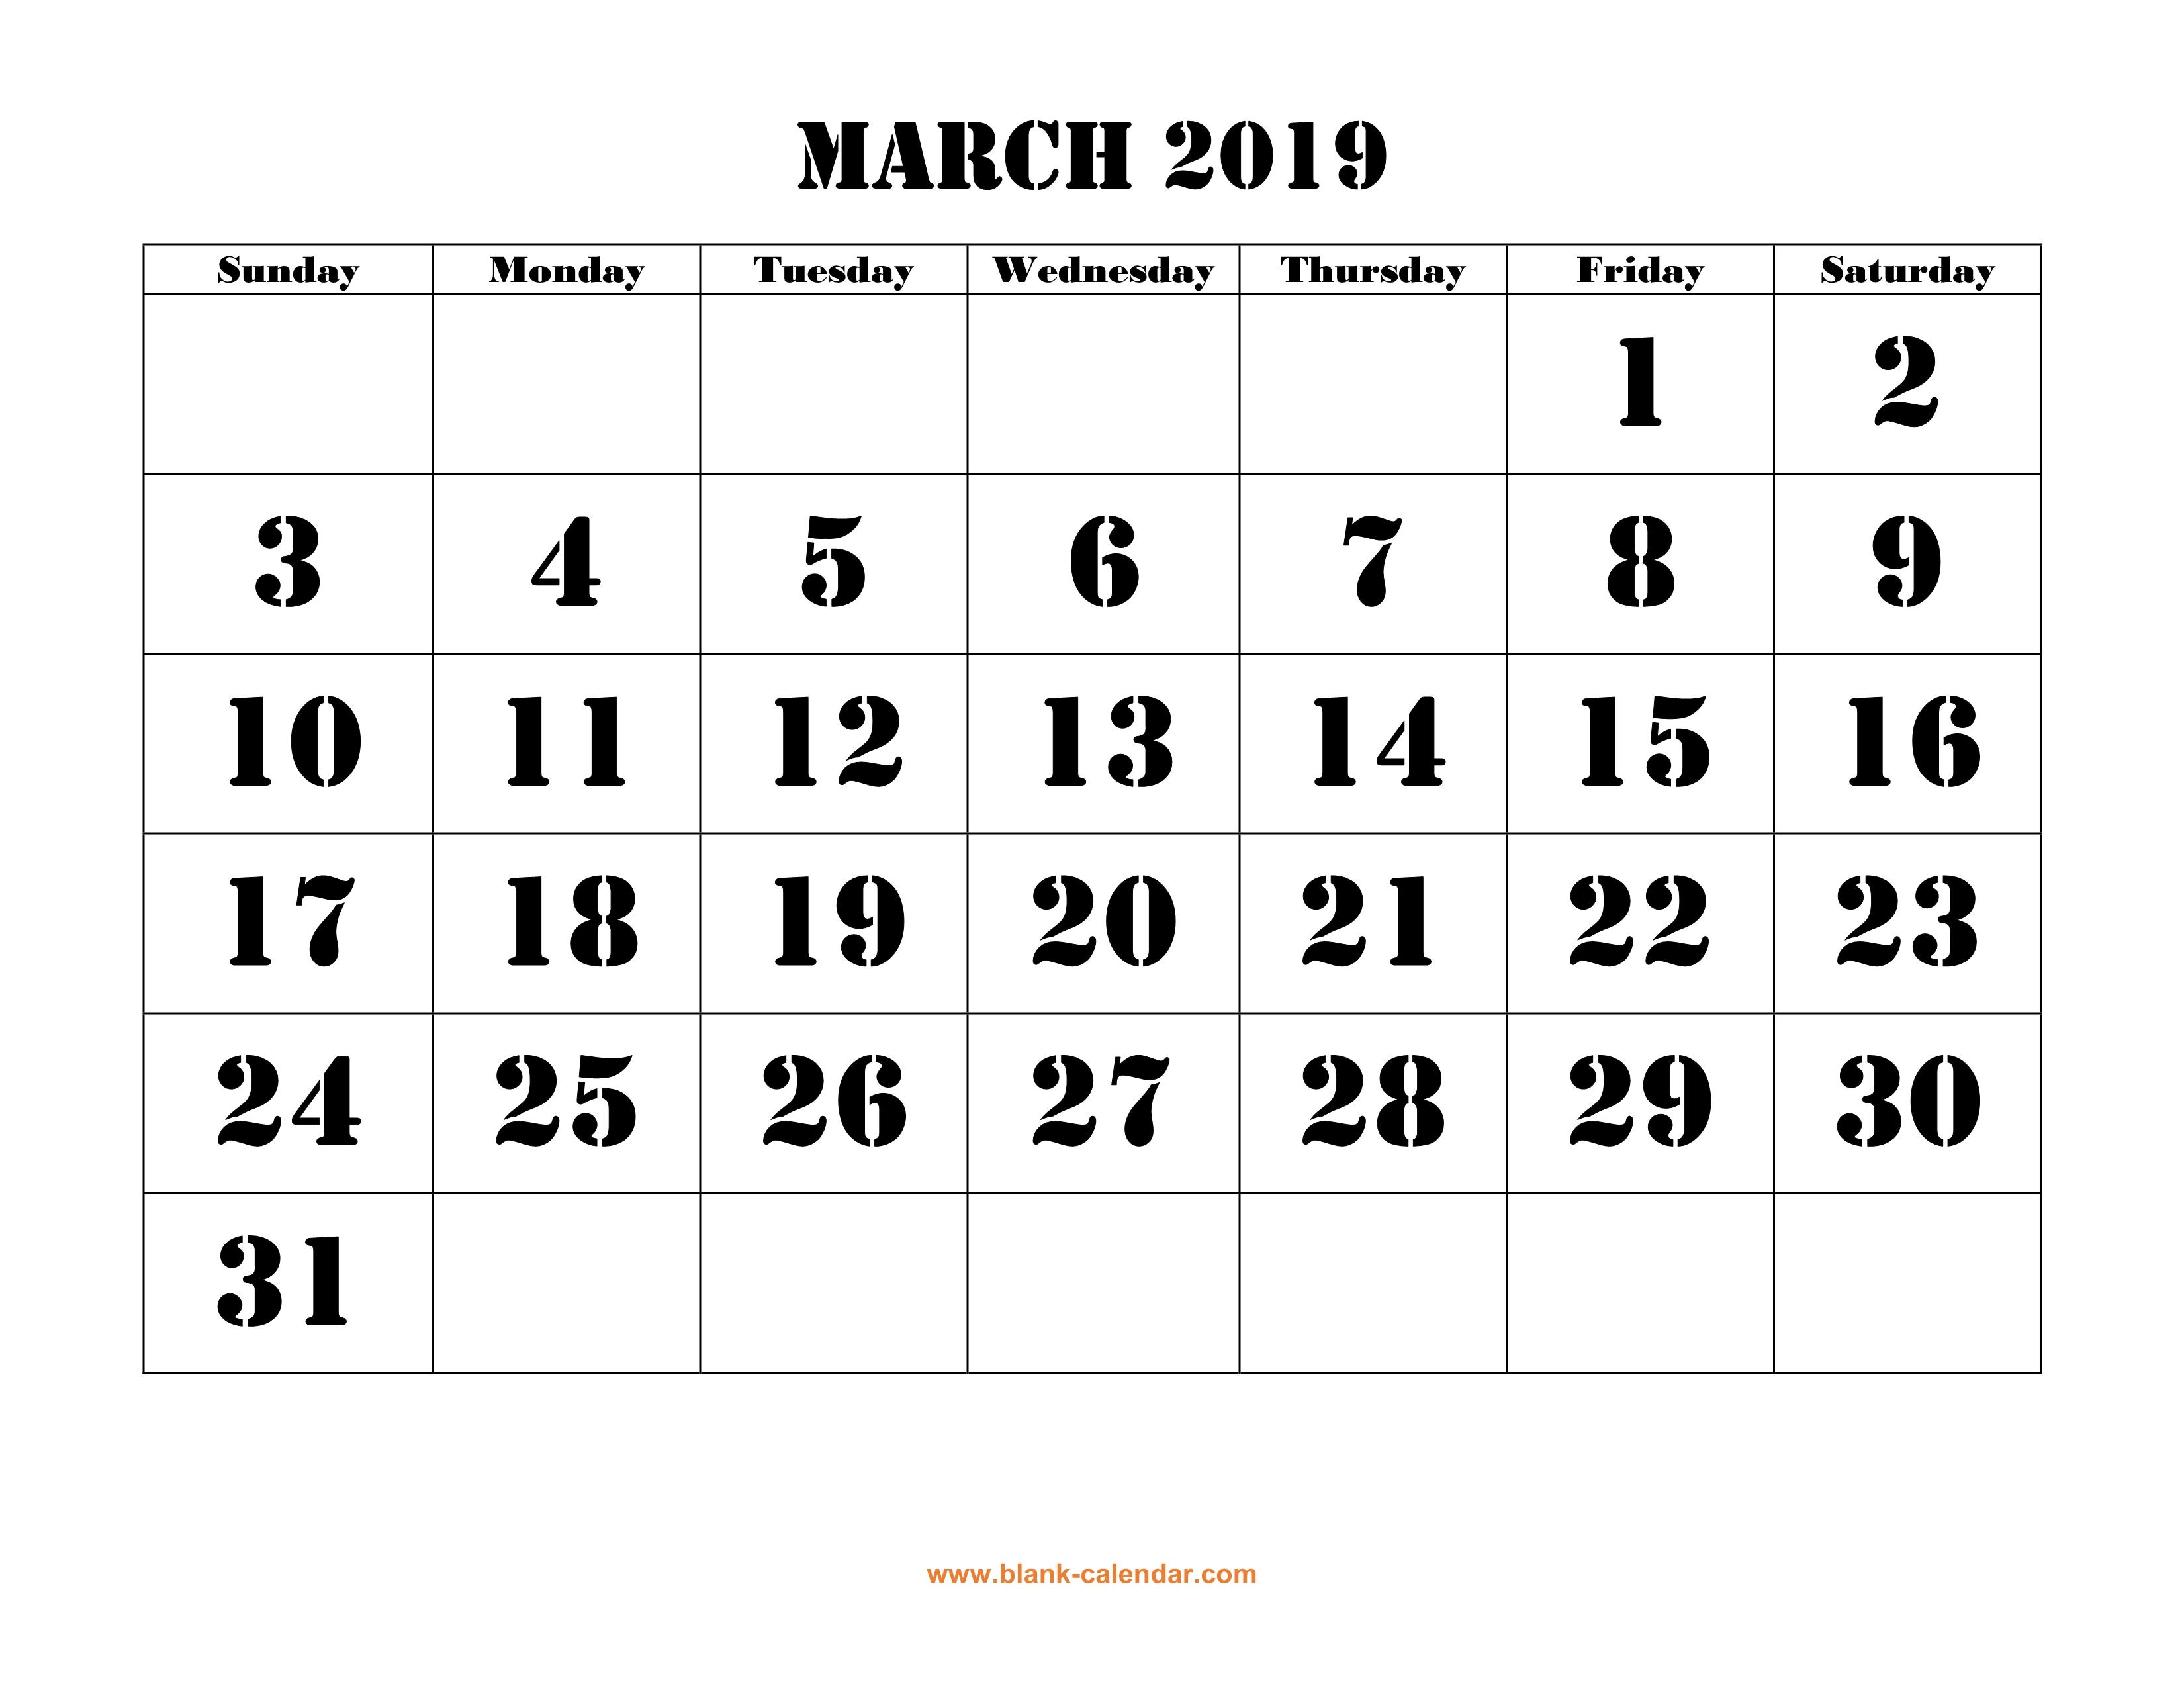 Free Download Printable March 2019 Calendar, Large Font